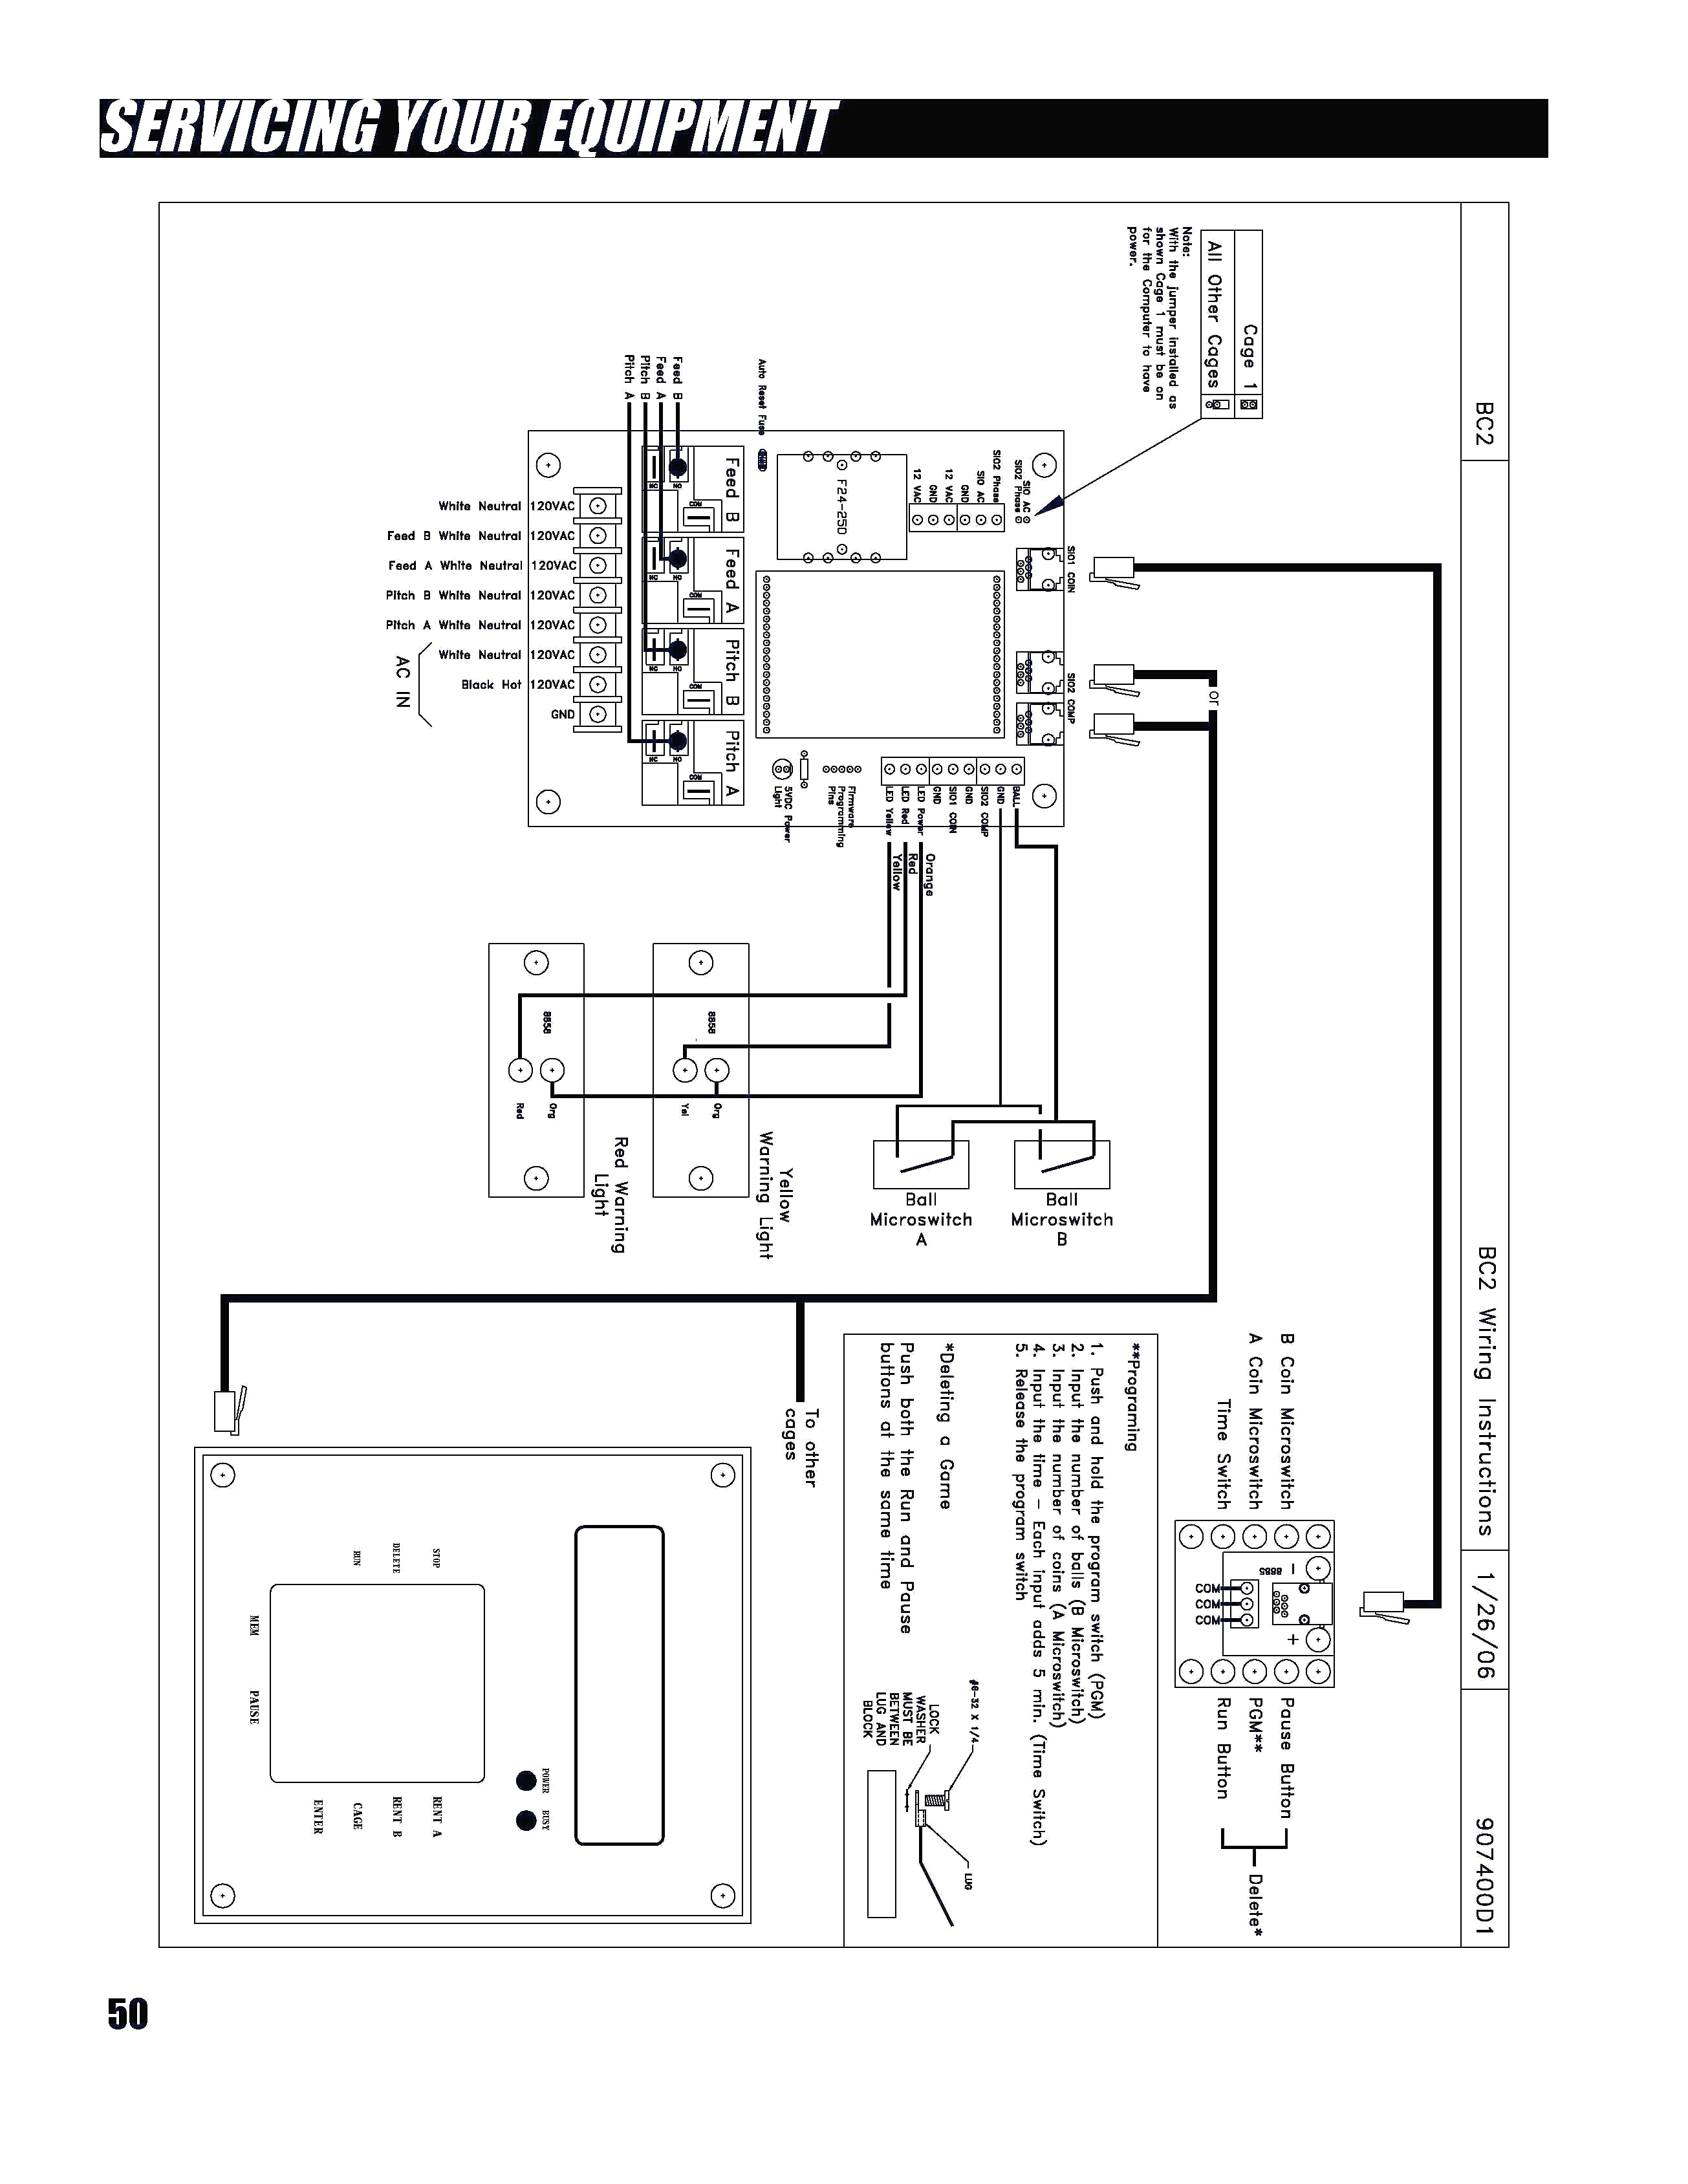 Wagner Electric Motor Wiring Diagram   Free Wiring Diagram - Dayton Electric Motors Wiring Diagram